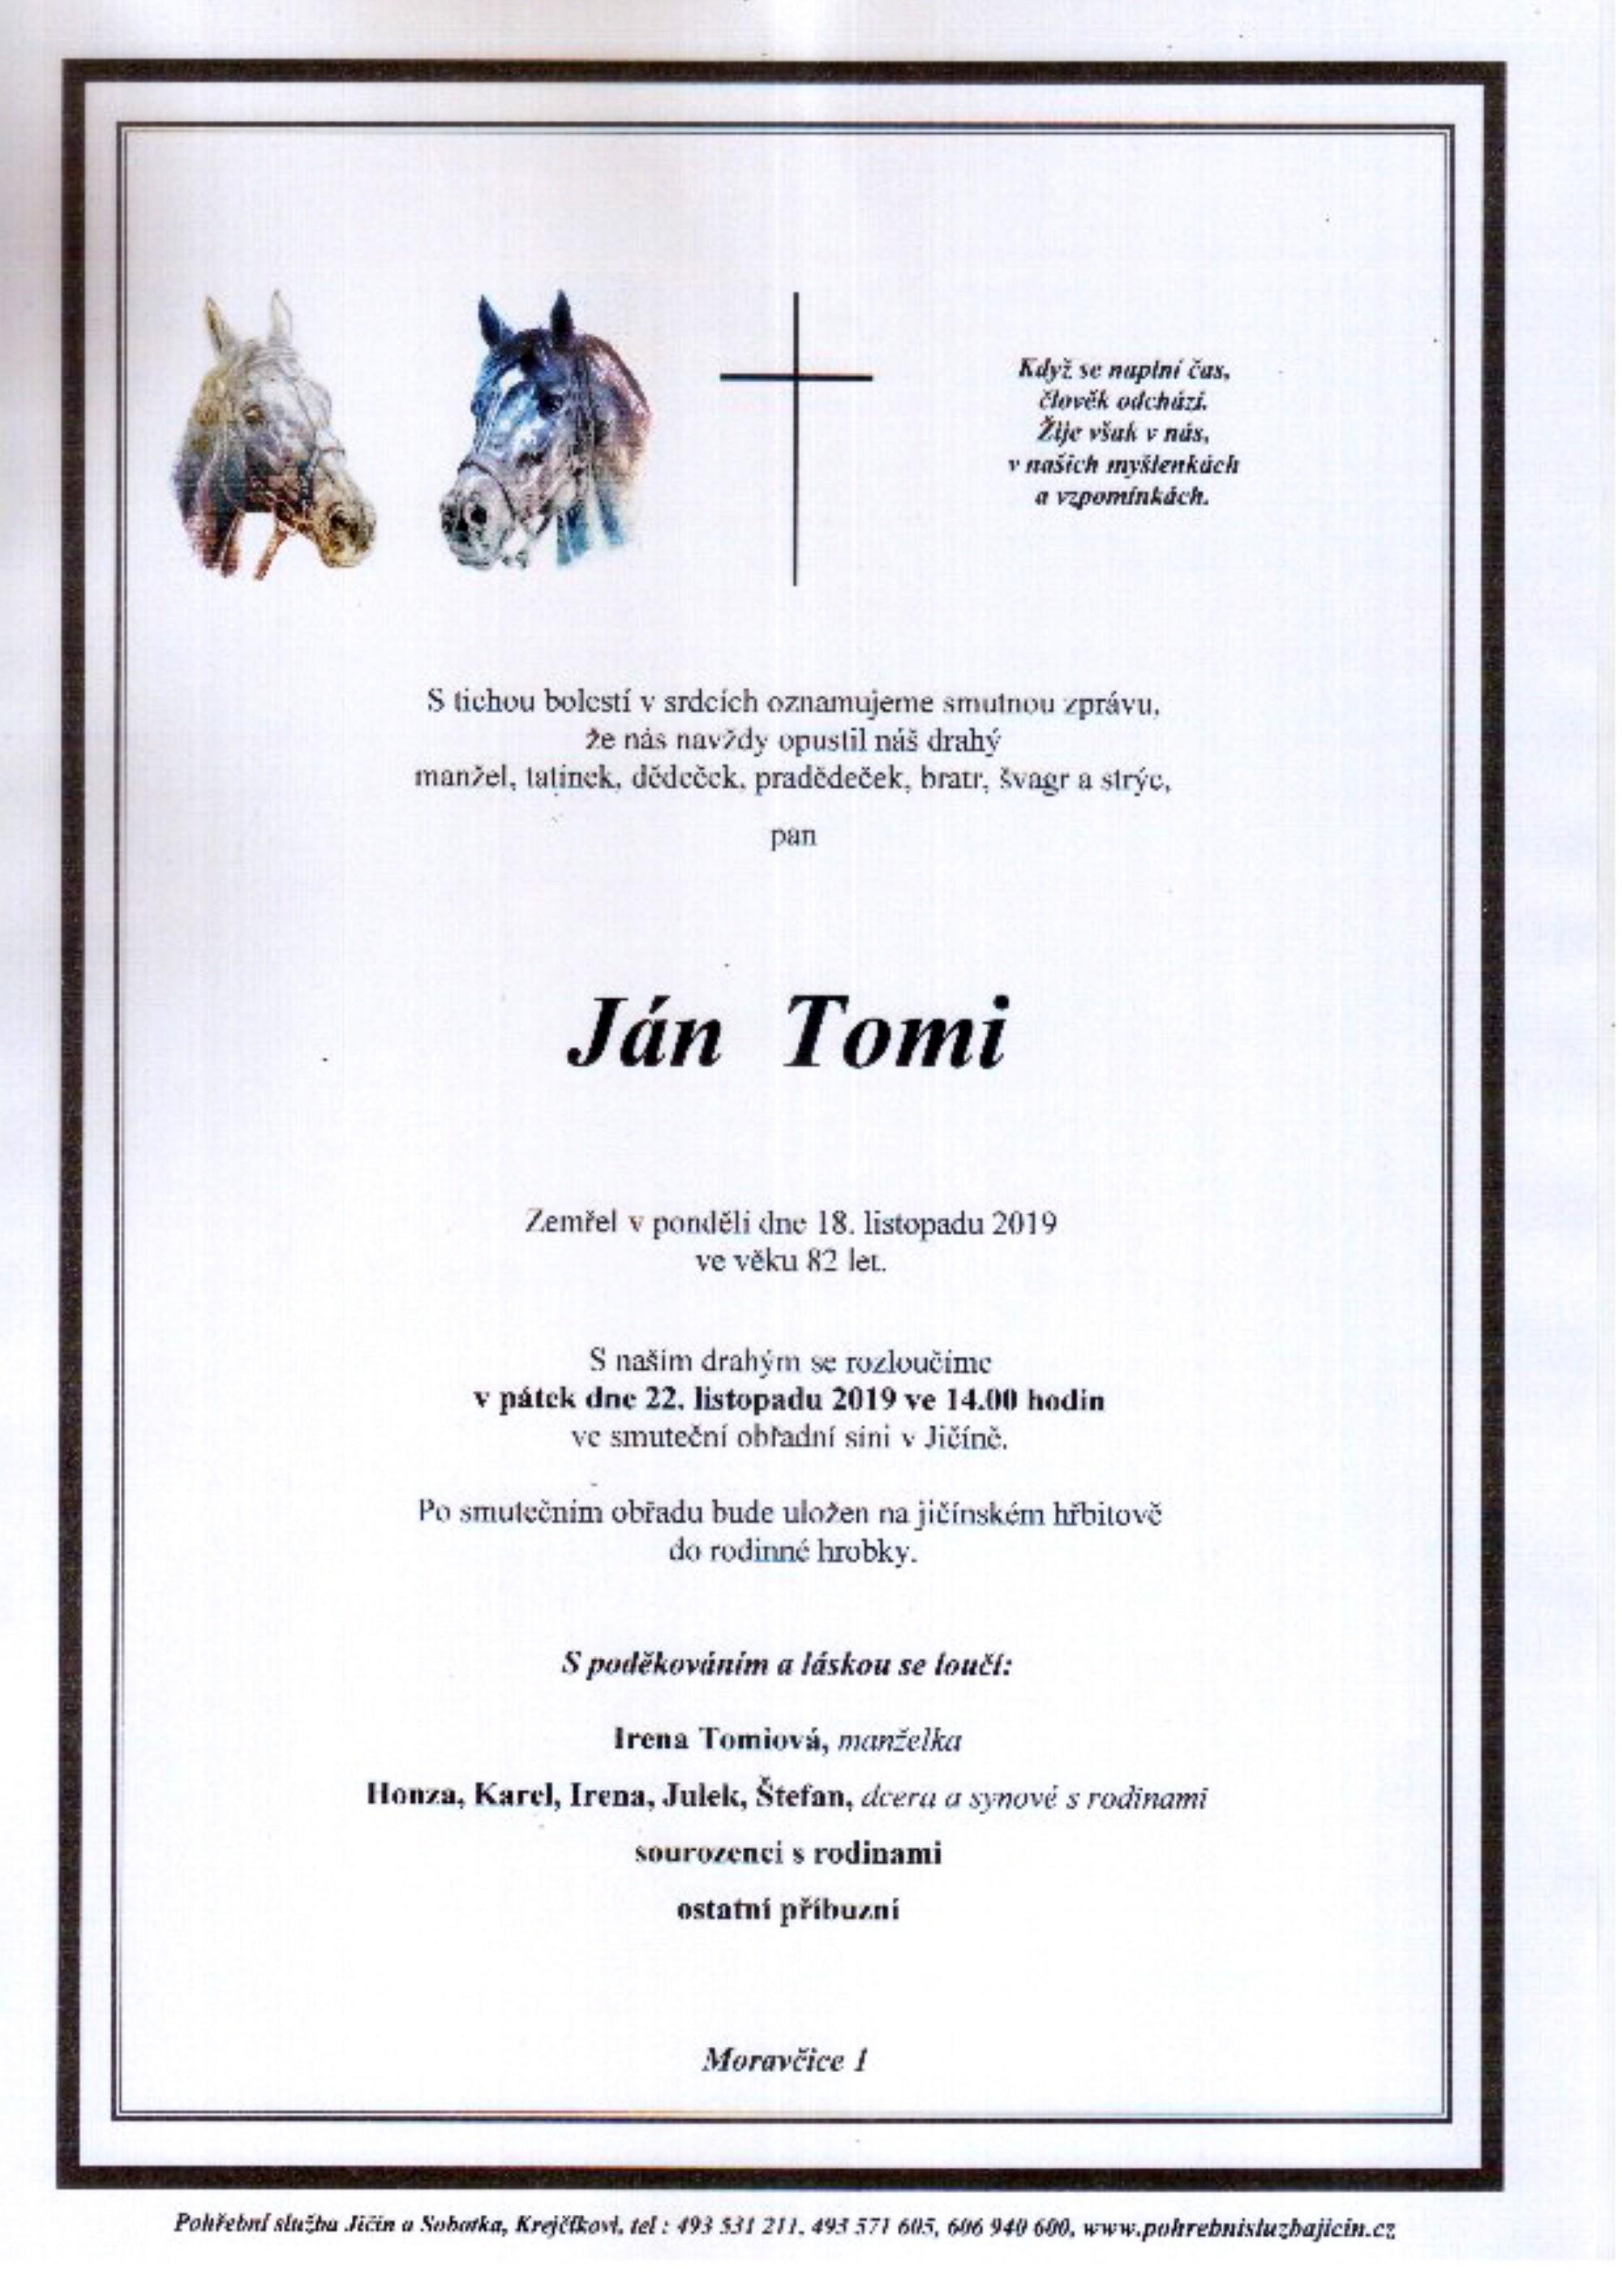 Ján Tomi